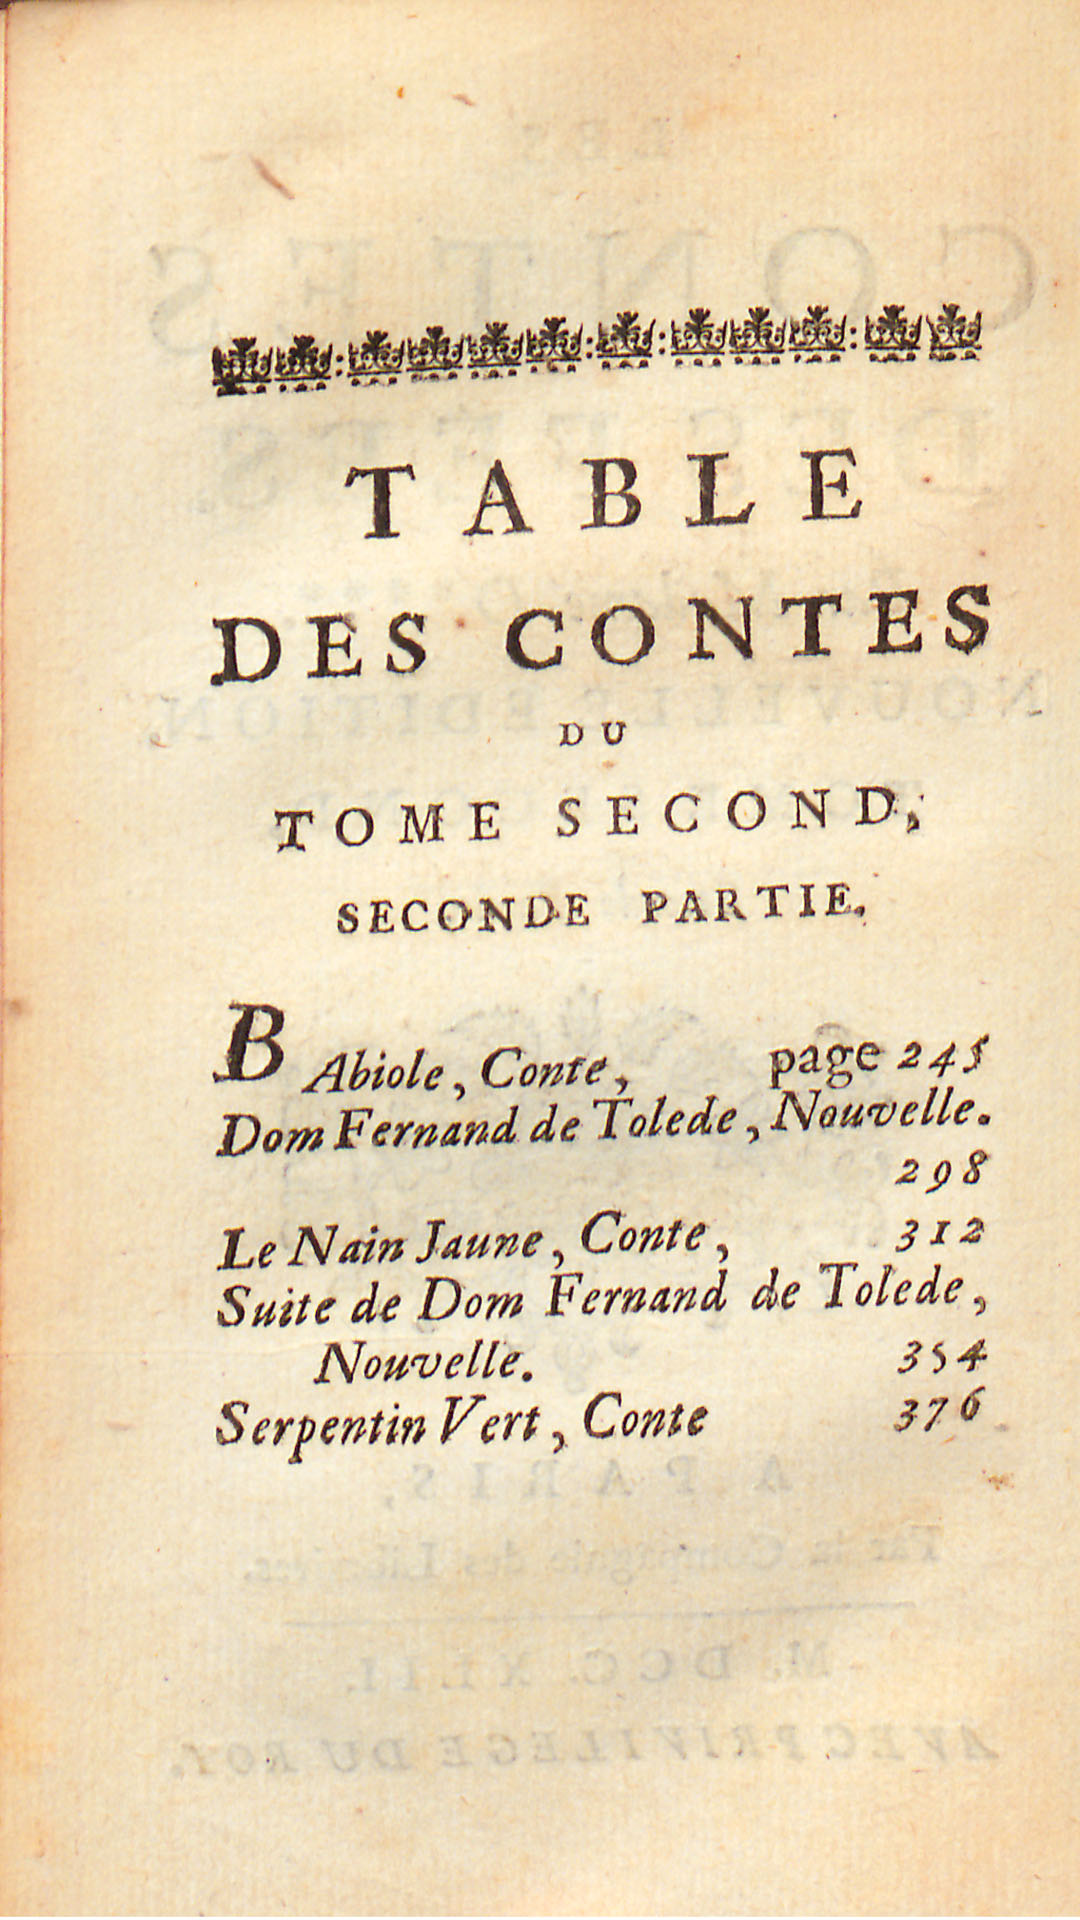 Table des contes, tome second, seconde partie